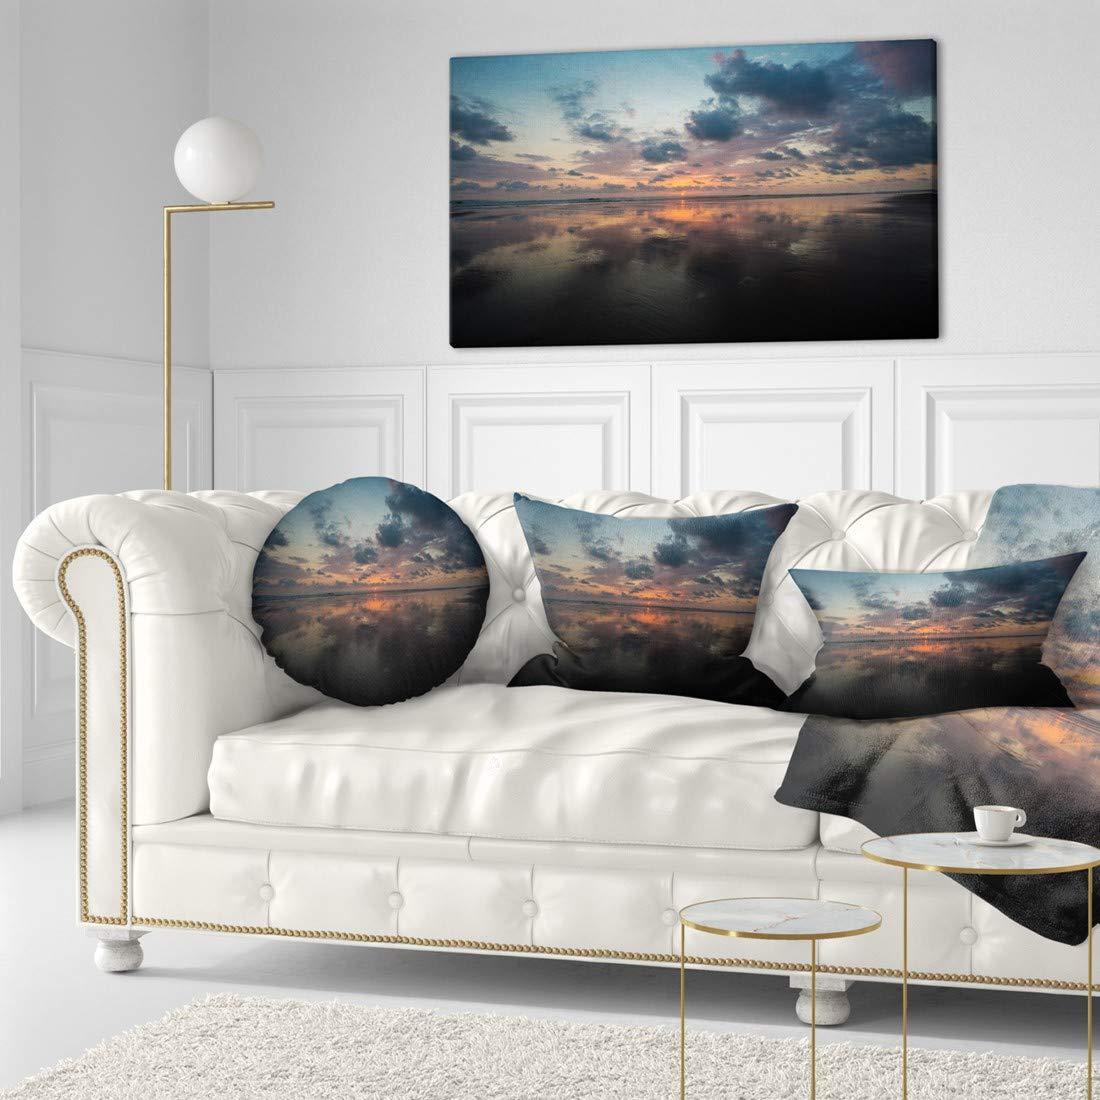 Design Art Pt10824 40 20 Matapalo In Costa Rica Beach Sunset Extra Large Seascape Art Canvas 40x20 40x20 Amazon In Home Kitchen